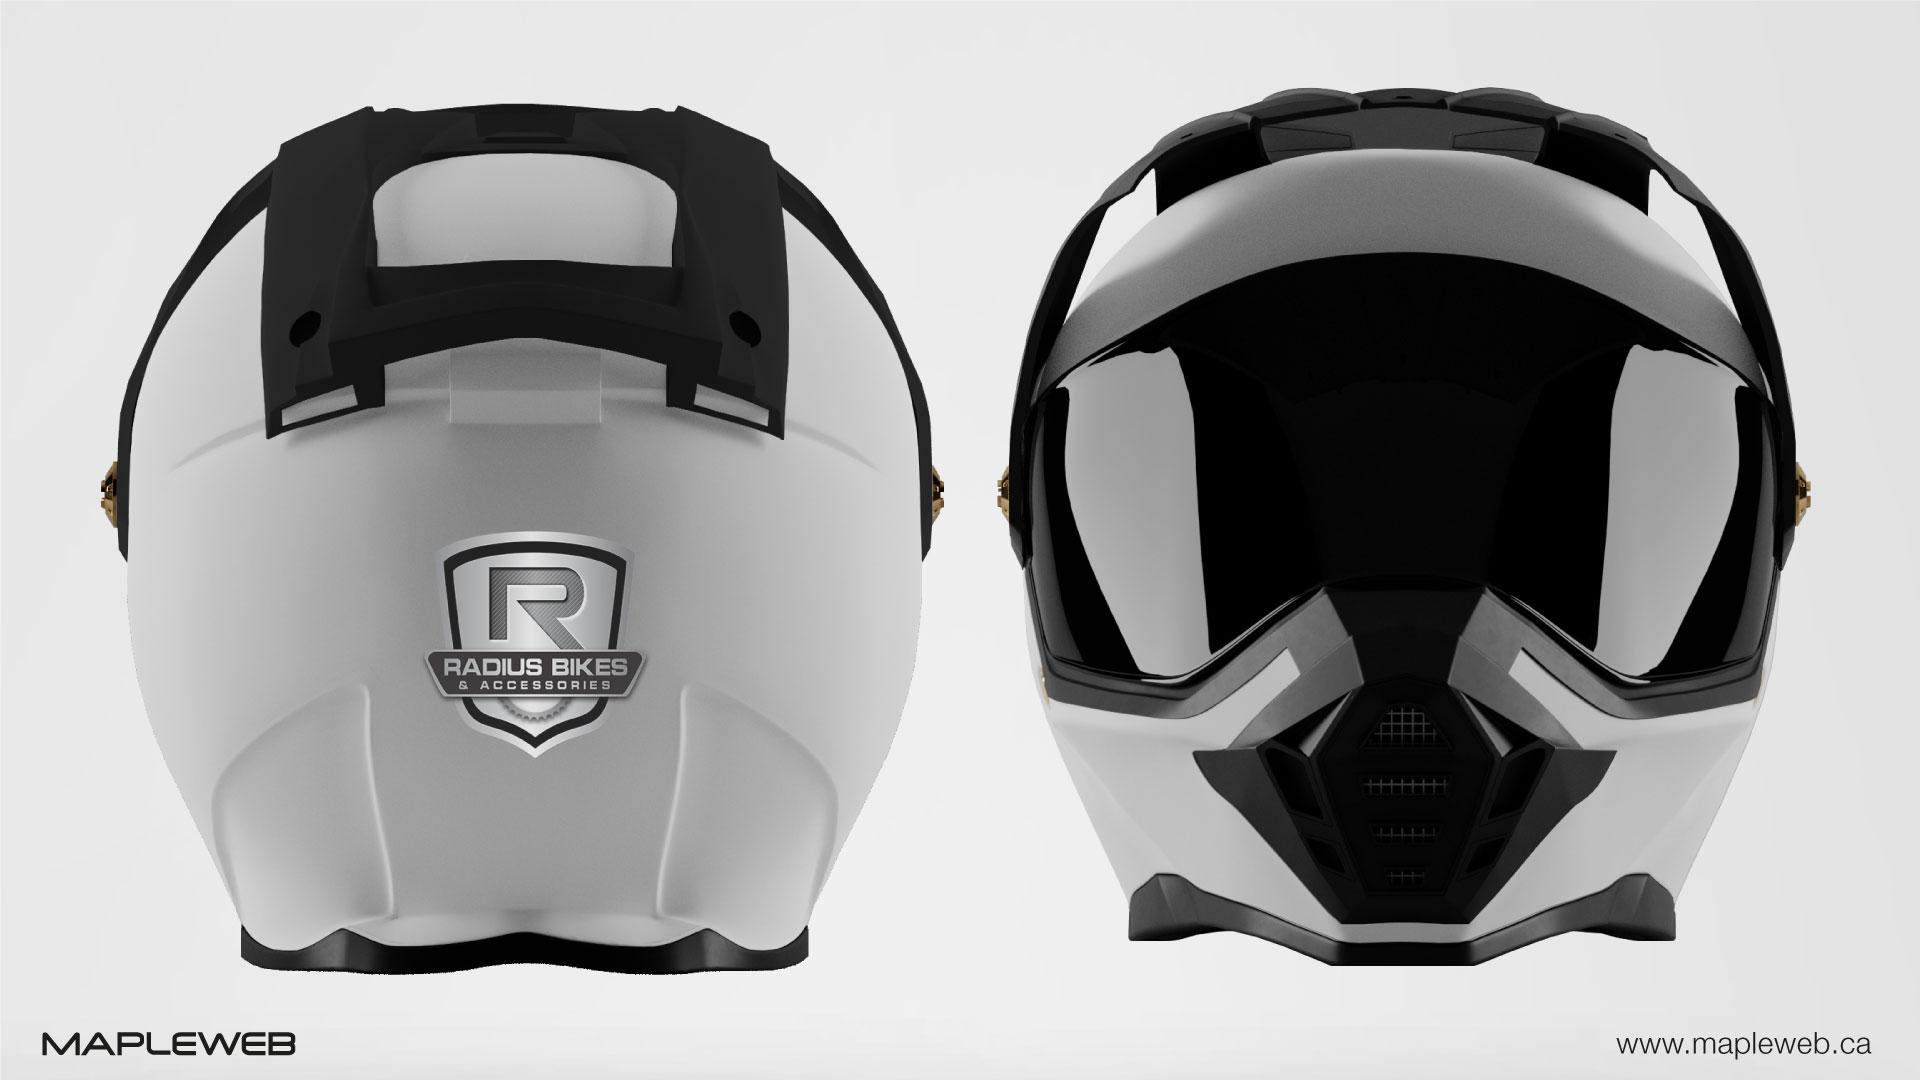 radius-bikes-brand-logo-design-by-mapleweb-vancouver-canada-helmet-mock